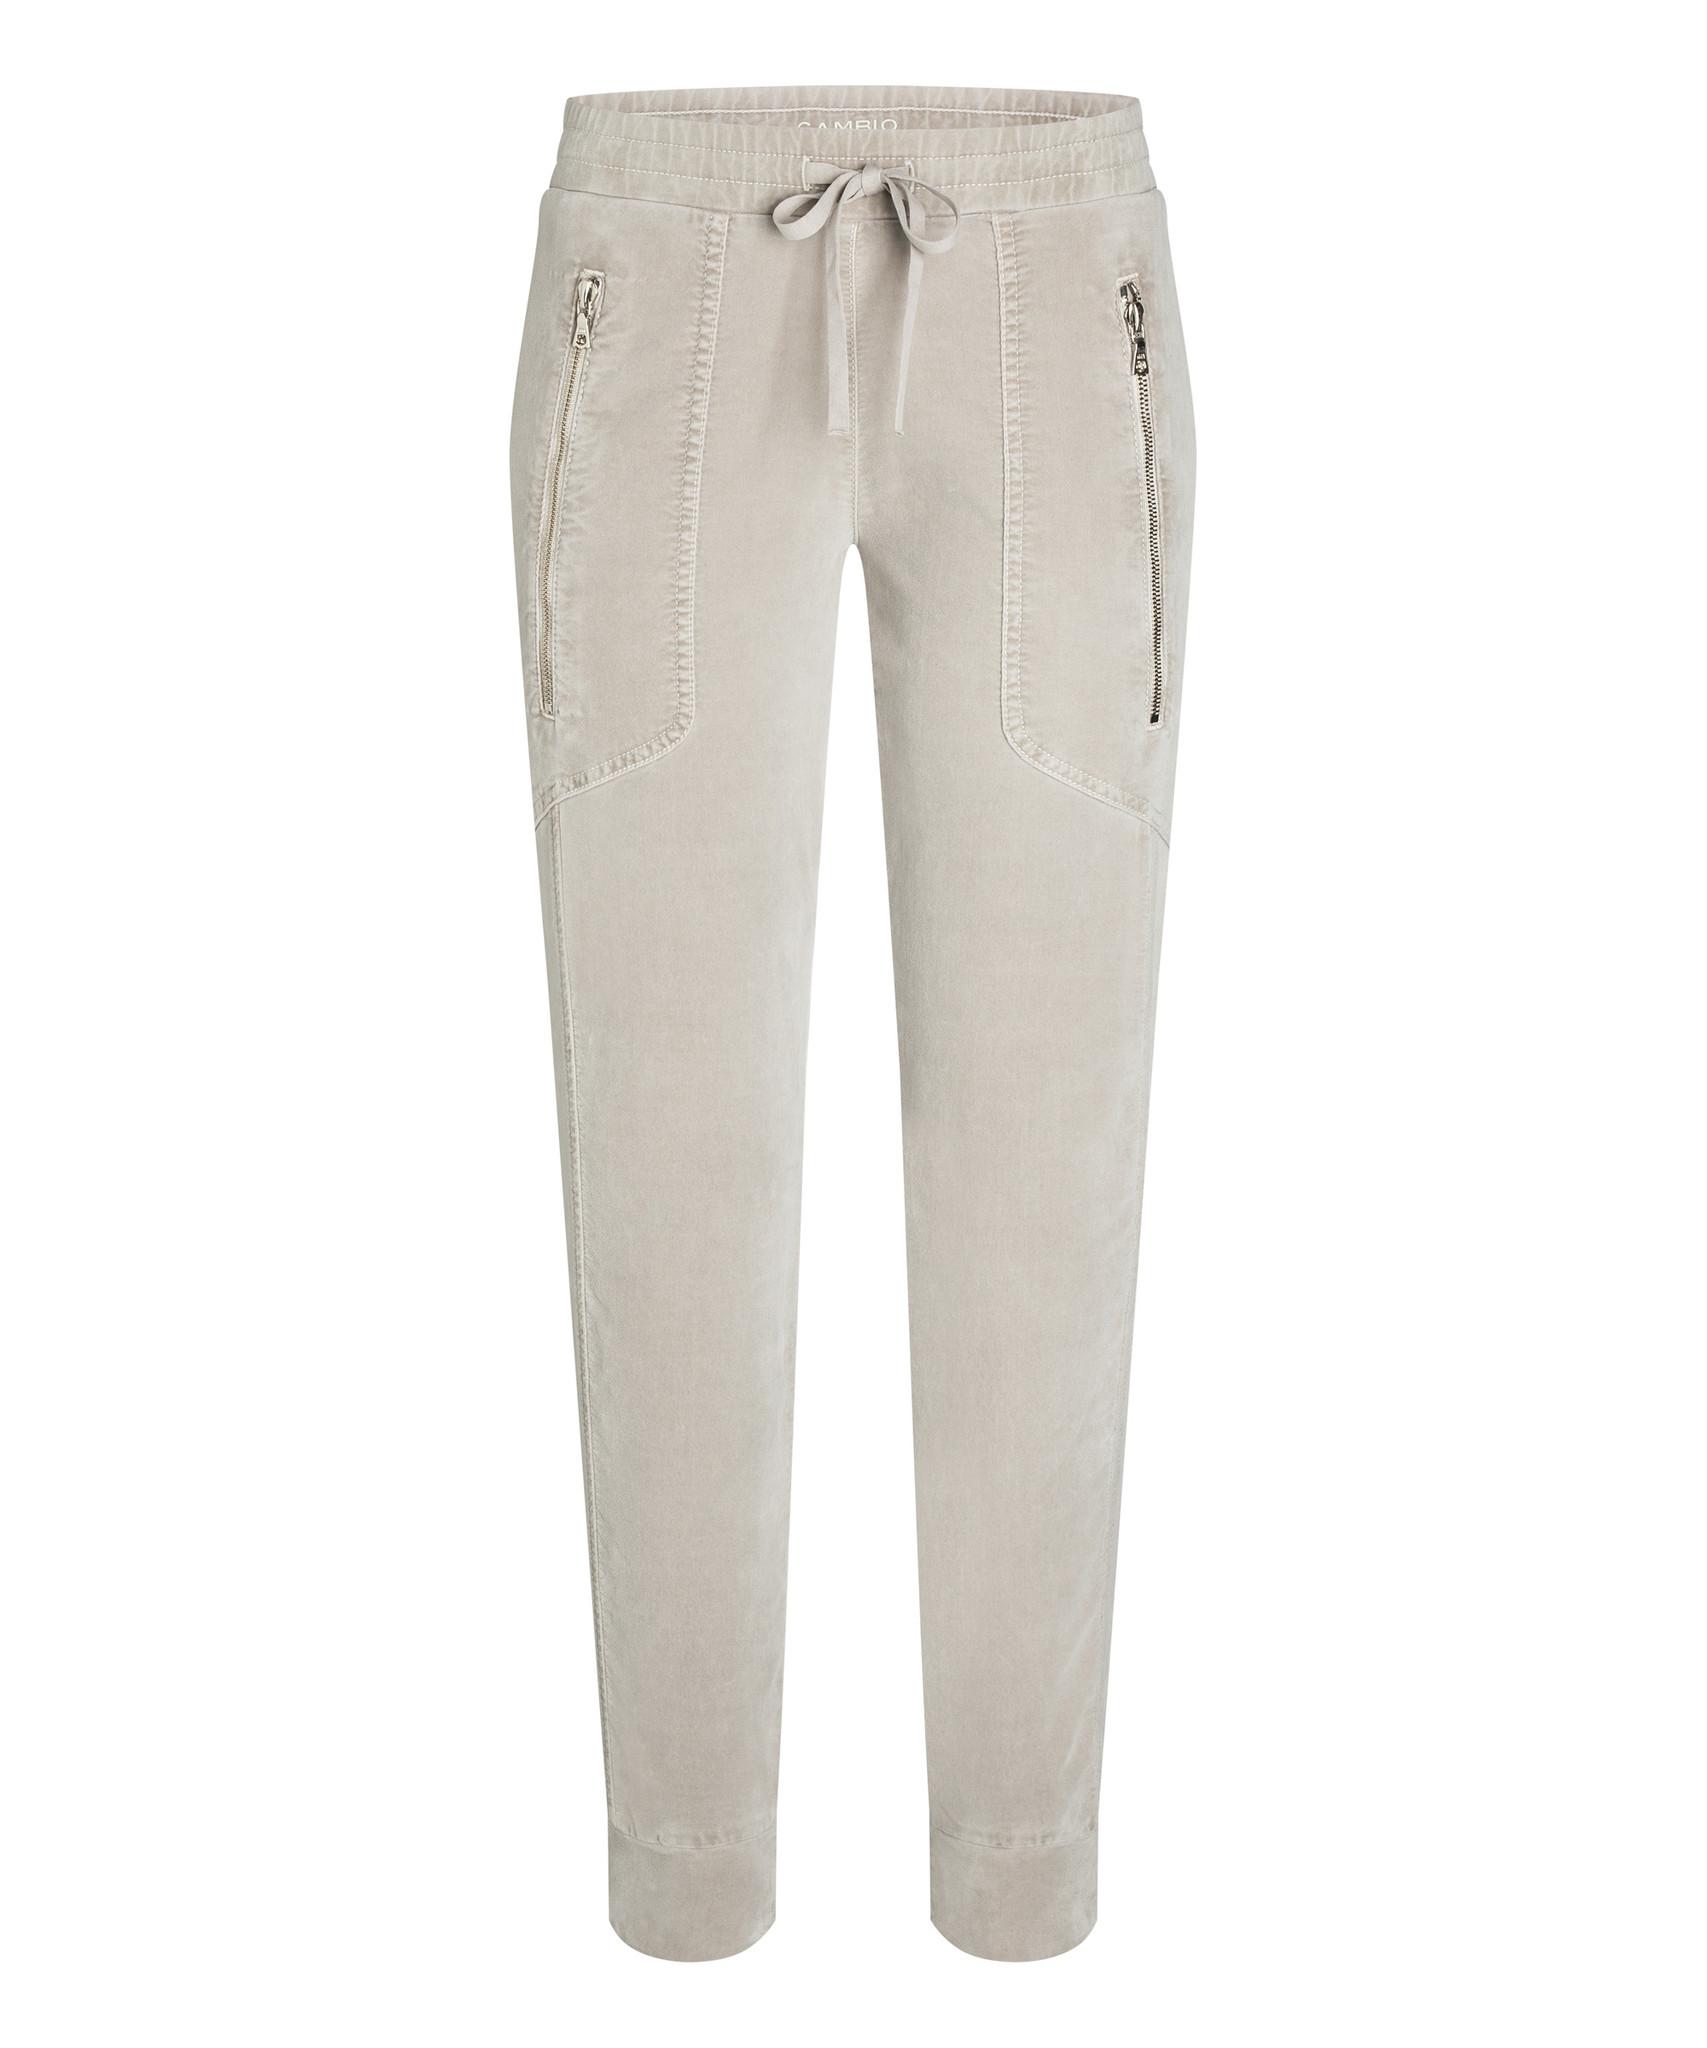 Cambio trousers JORDEN 7505-1